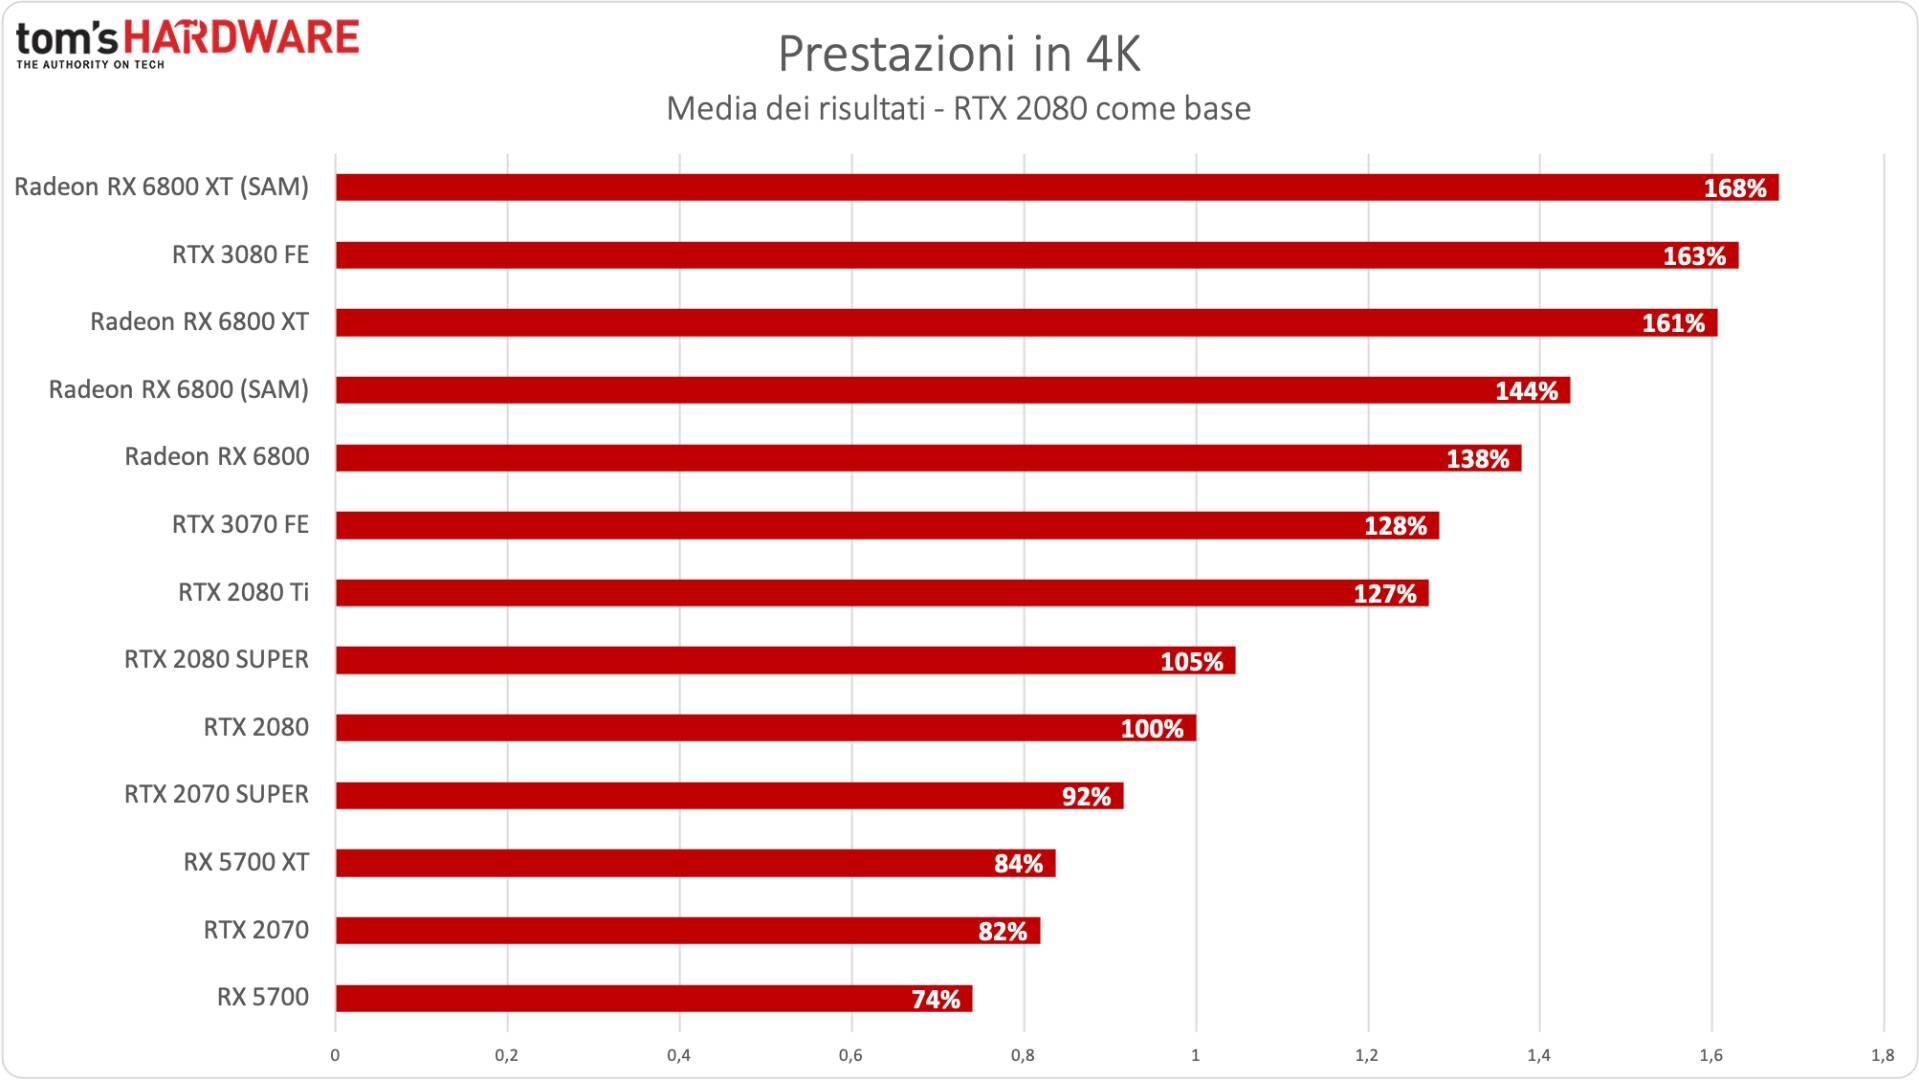 Benchmark Radeon RX 6800 XT / RX 6800 - 4K - Incremento % RTX 2080